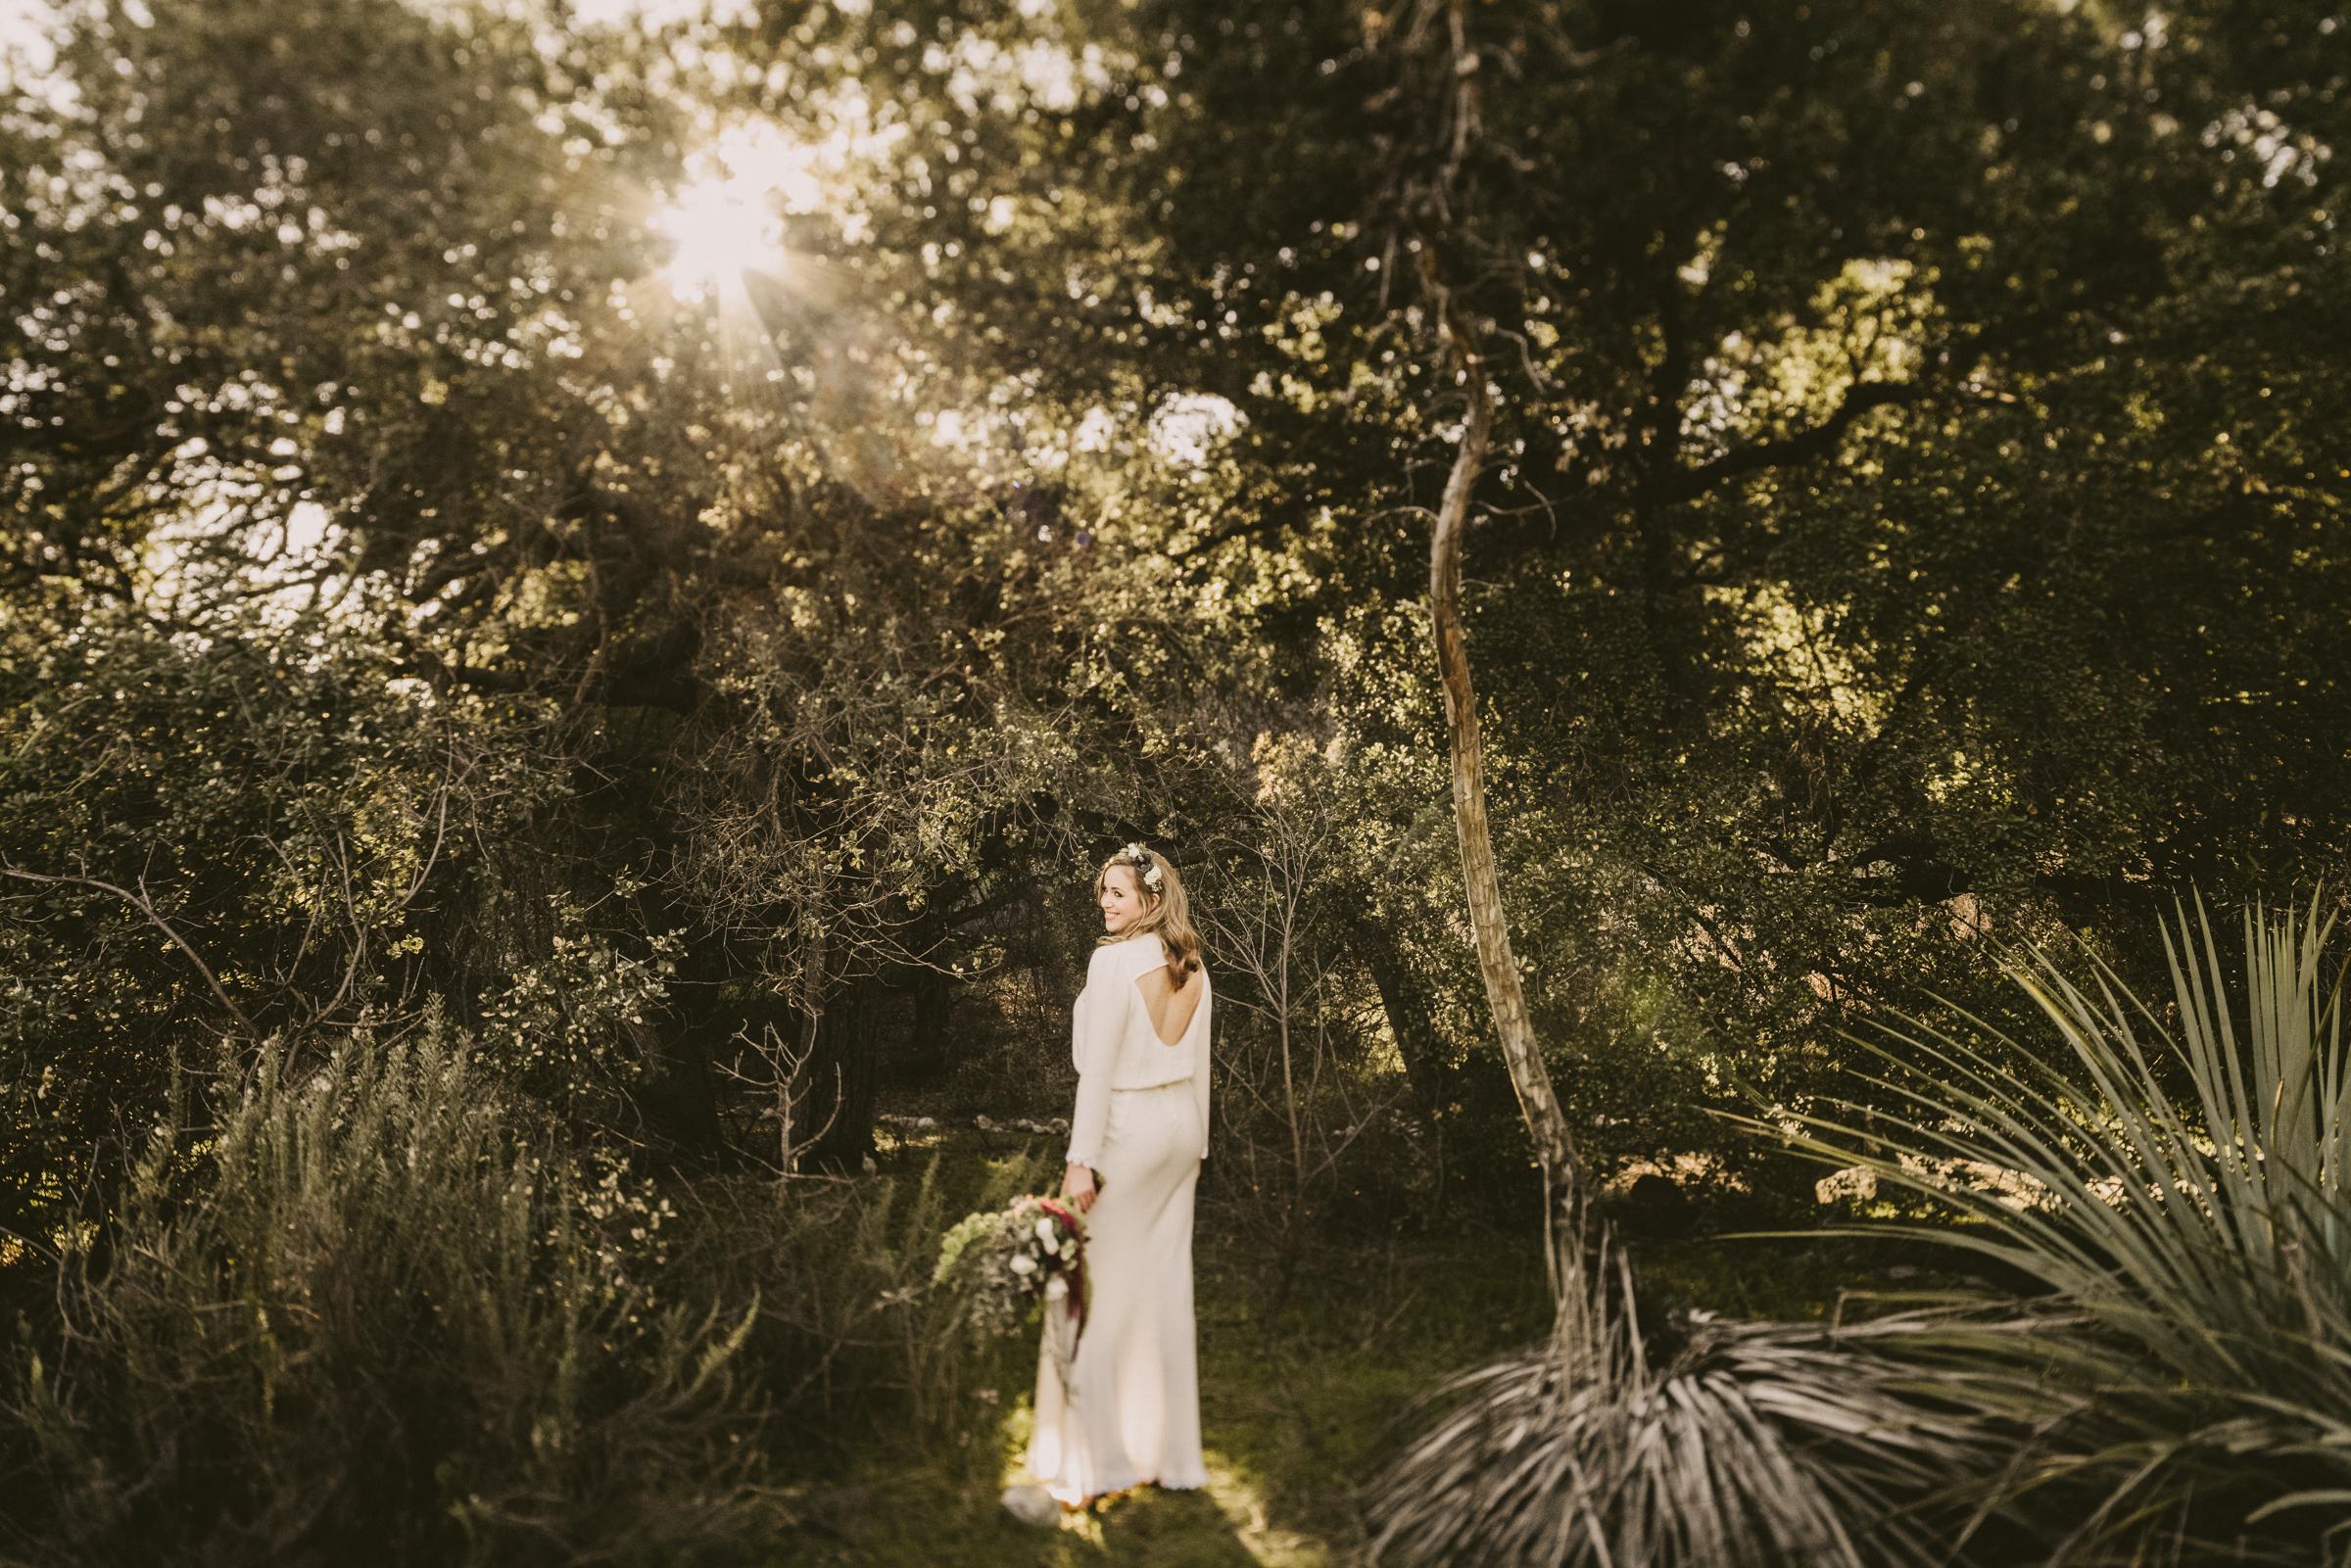 ©Isaiah + Taylor Photography - Intimate Elopement, Eaton Canyon, Los Angeles Wedding Photographer-3.jpg